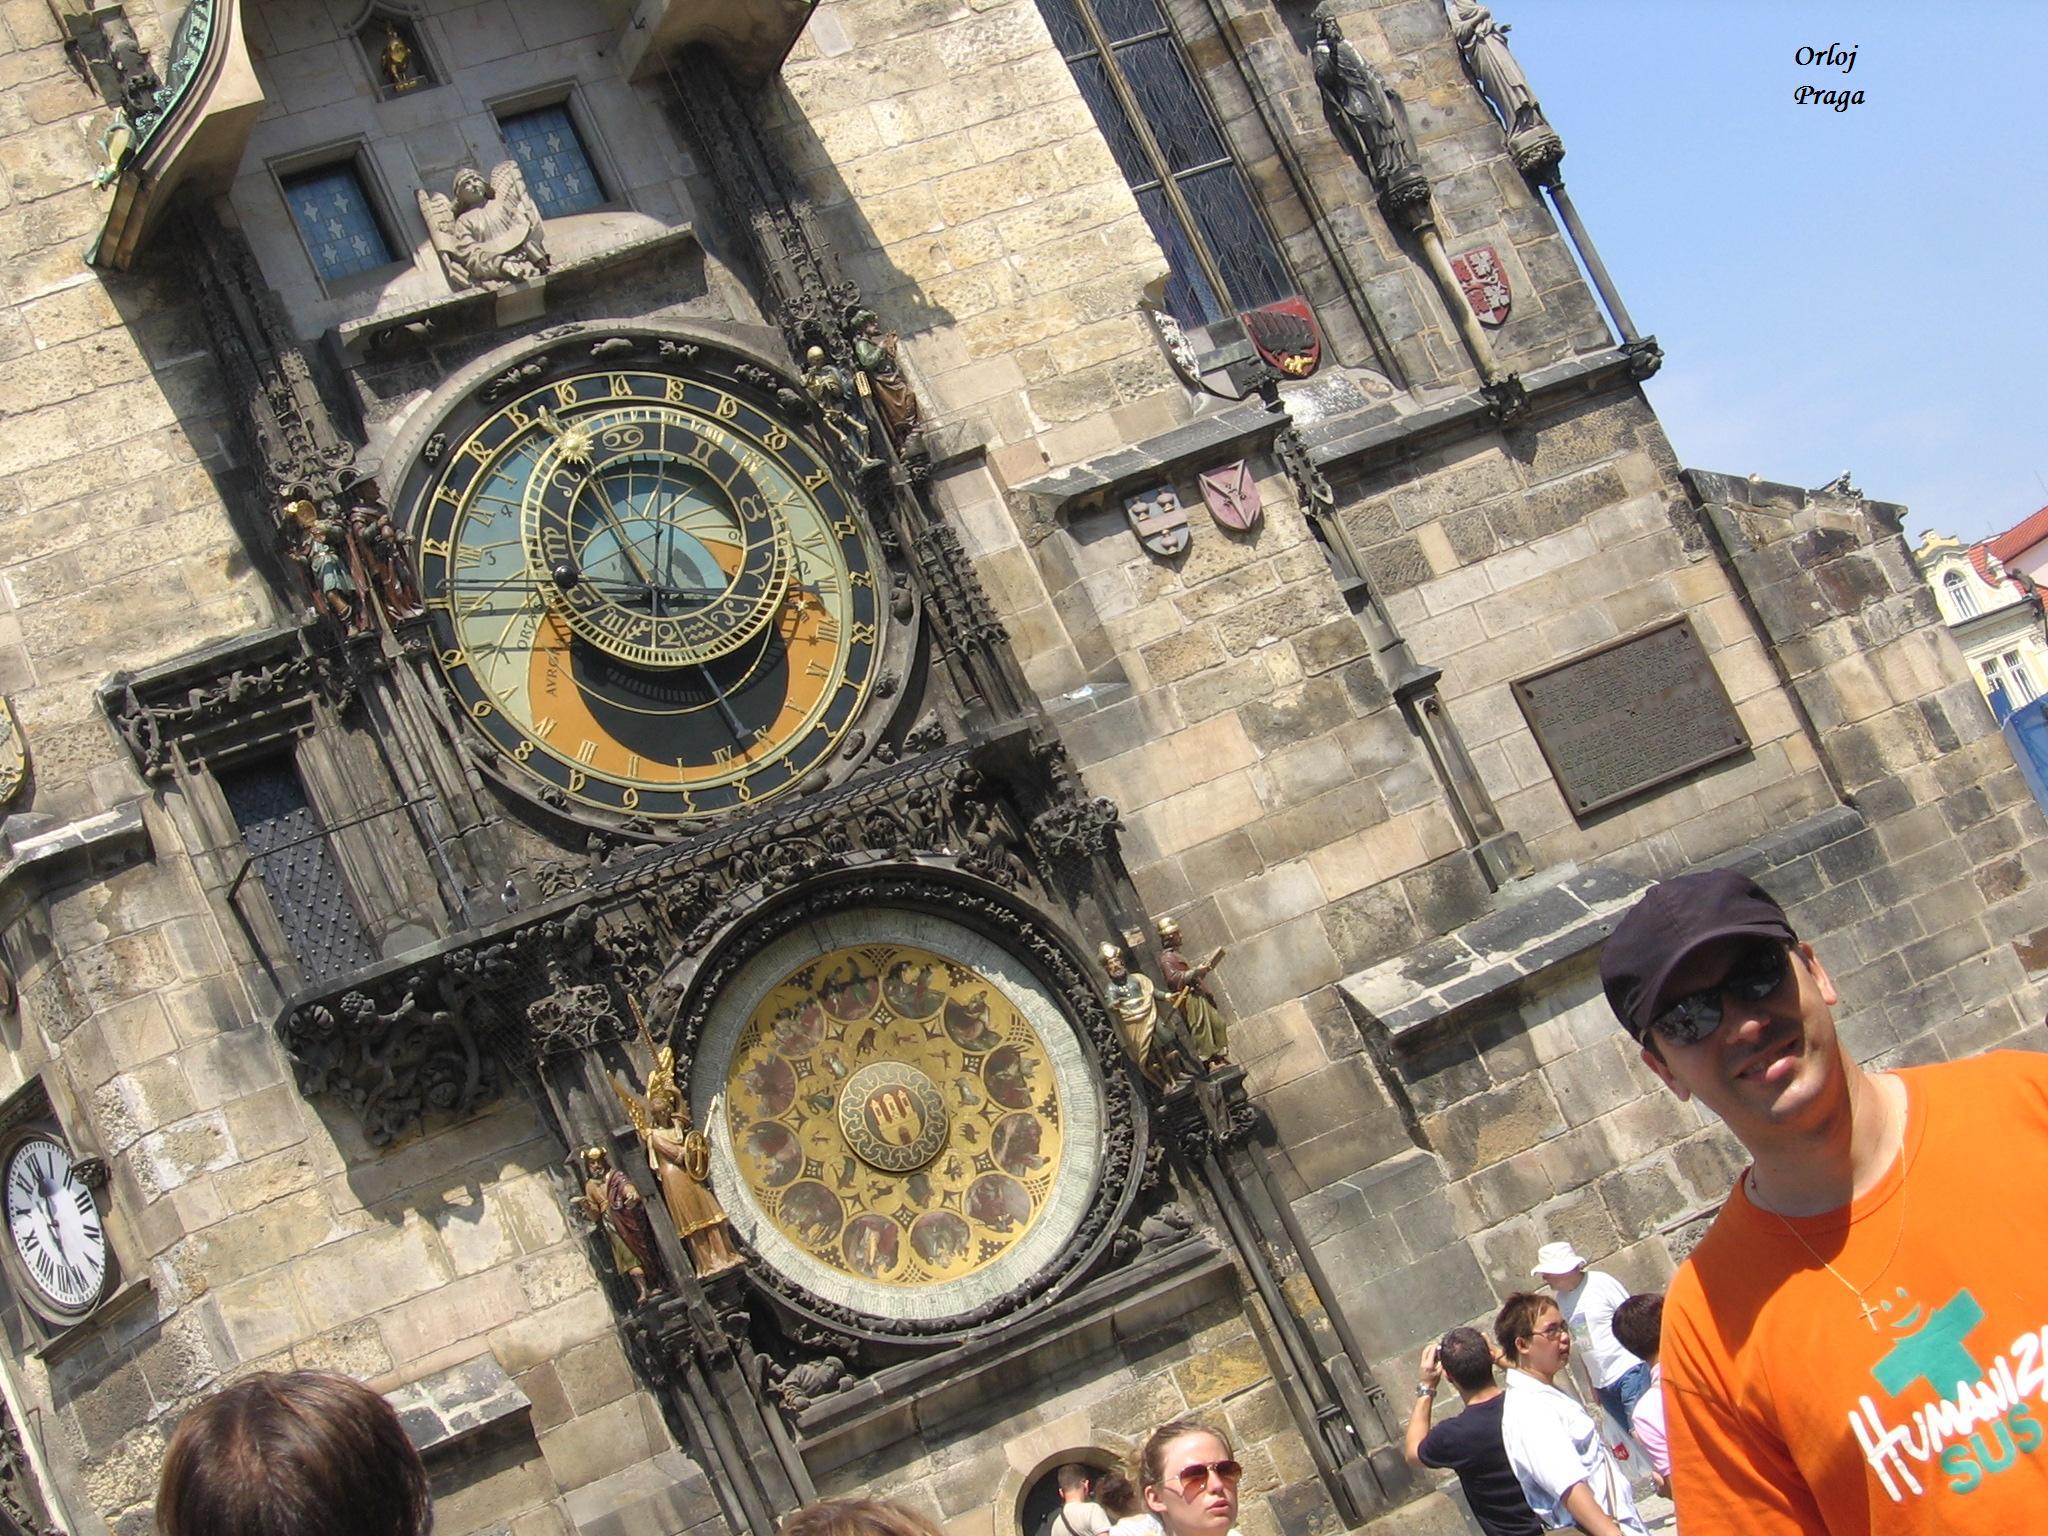 Relógio Astronômico - Orloj Praga